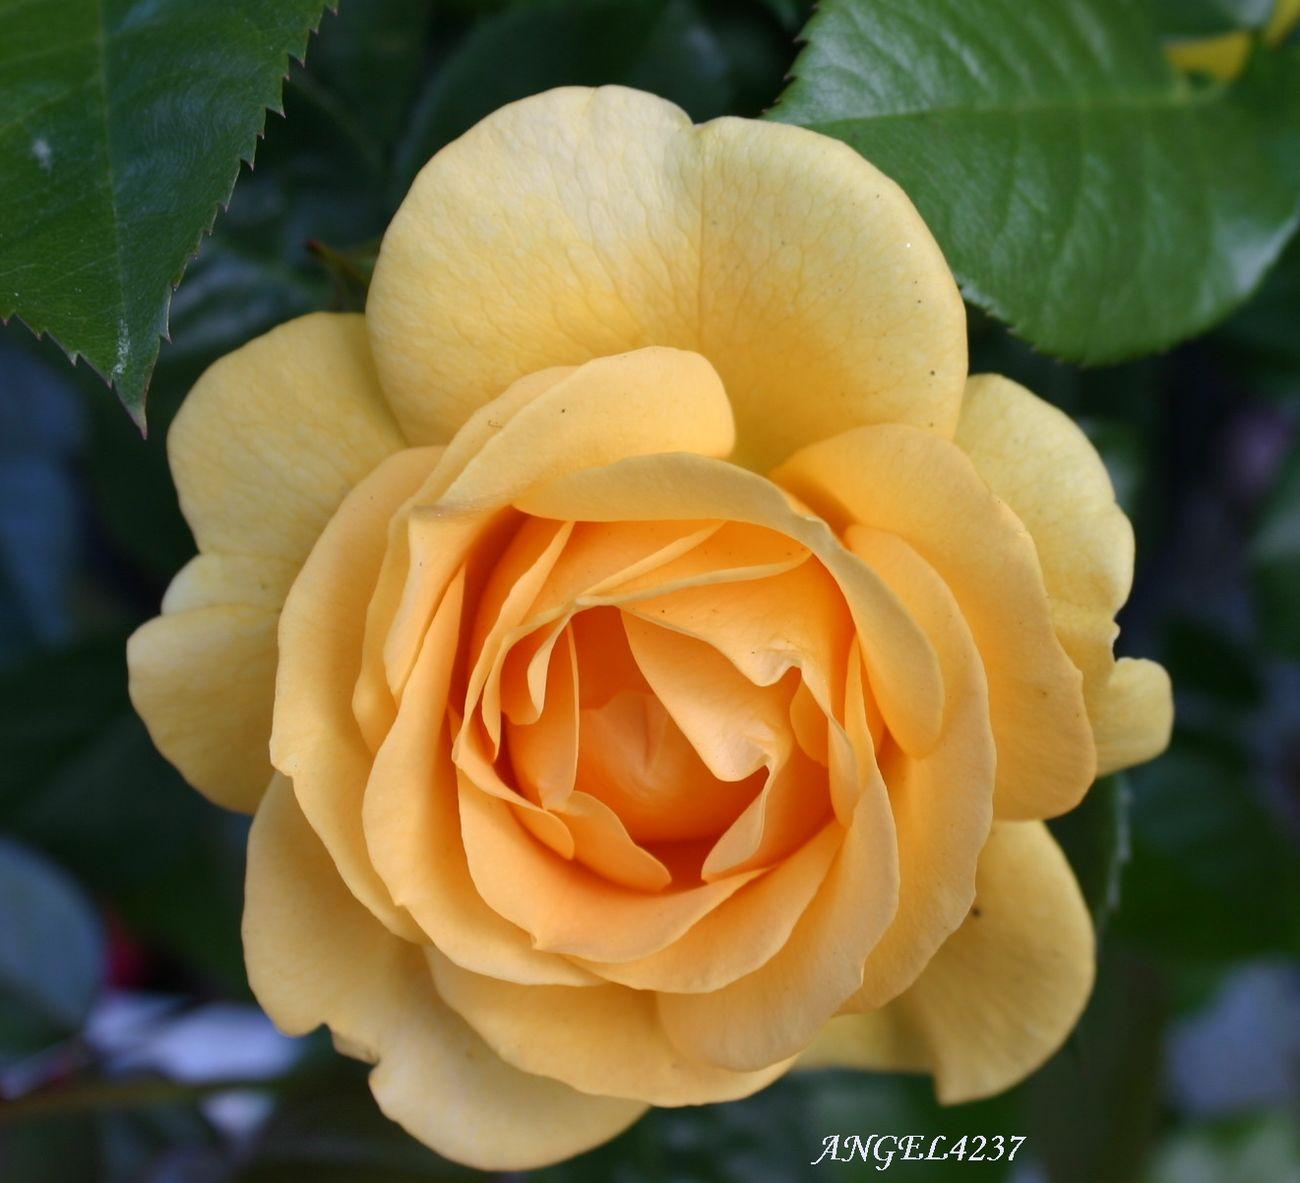 My_rose_collection Eye Em Best Shots Floralperfection BeautyAndMadness